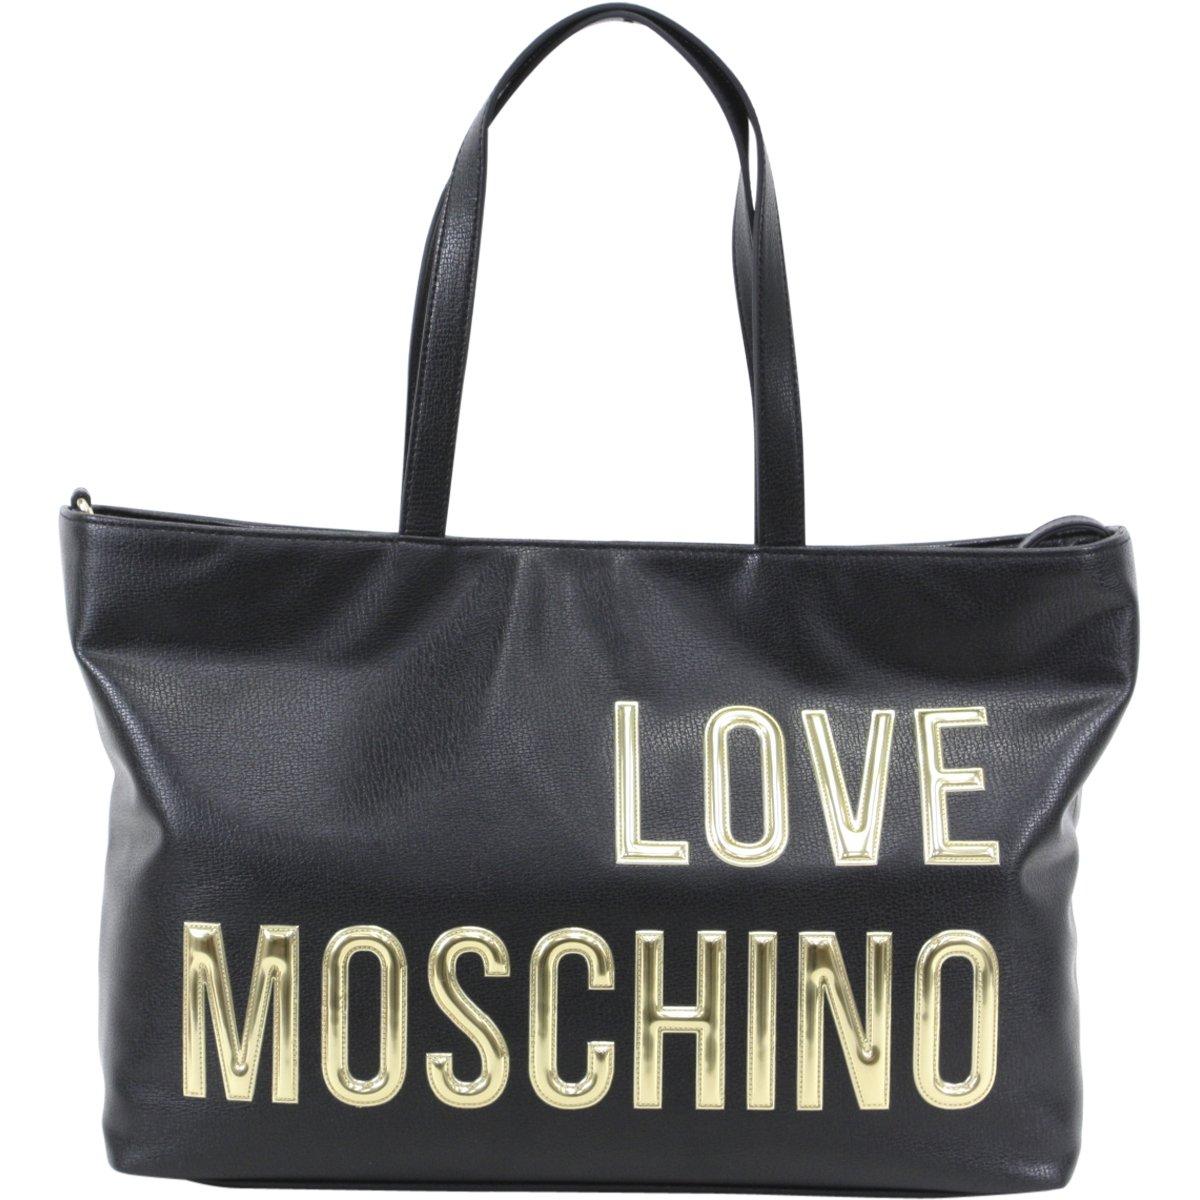 Love Moschino shopping bag Pu black